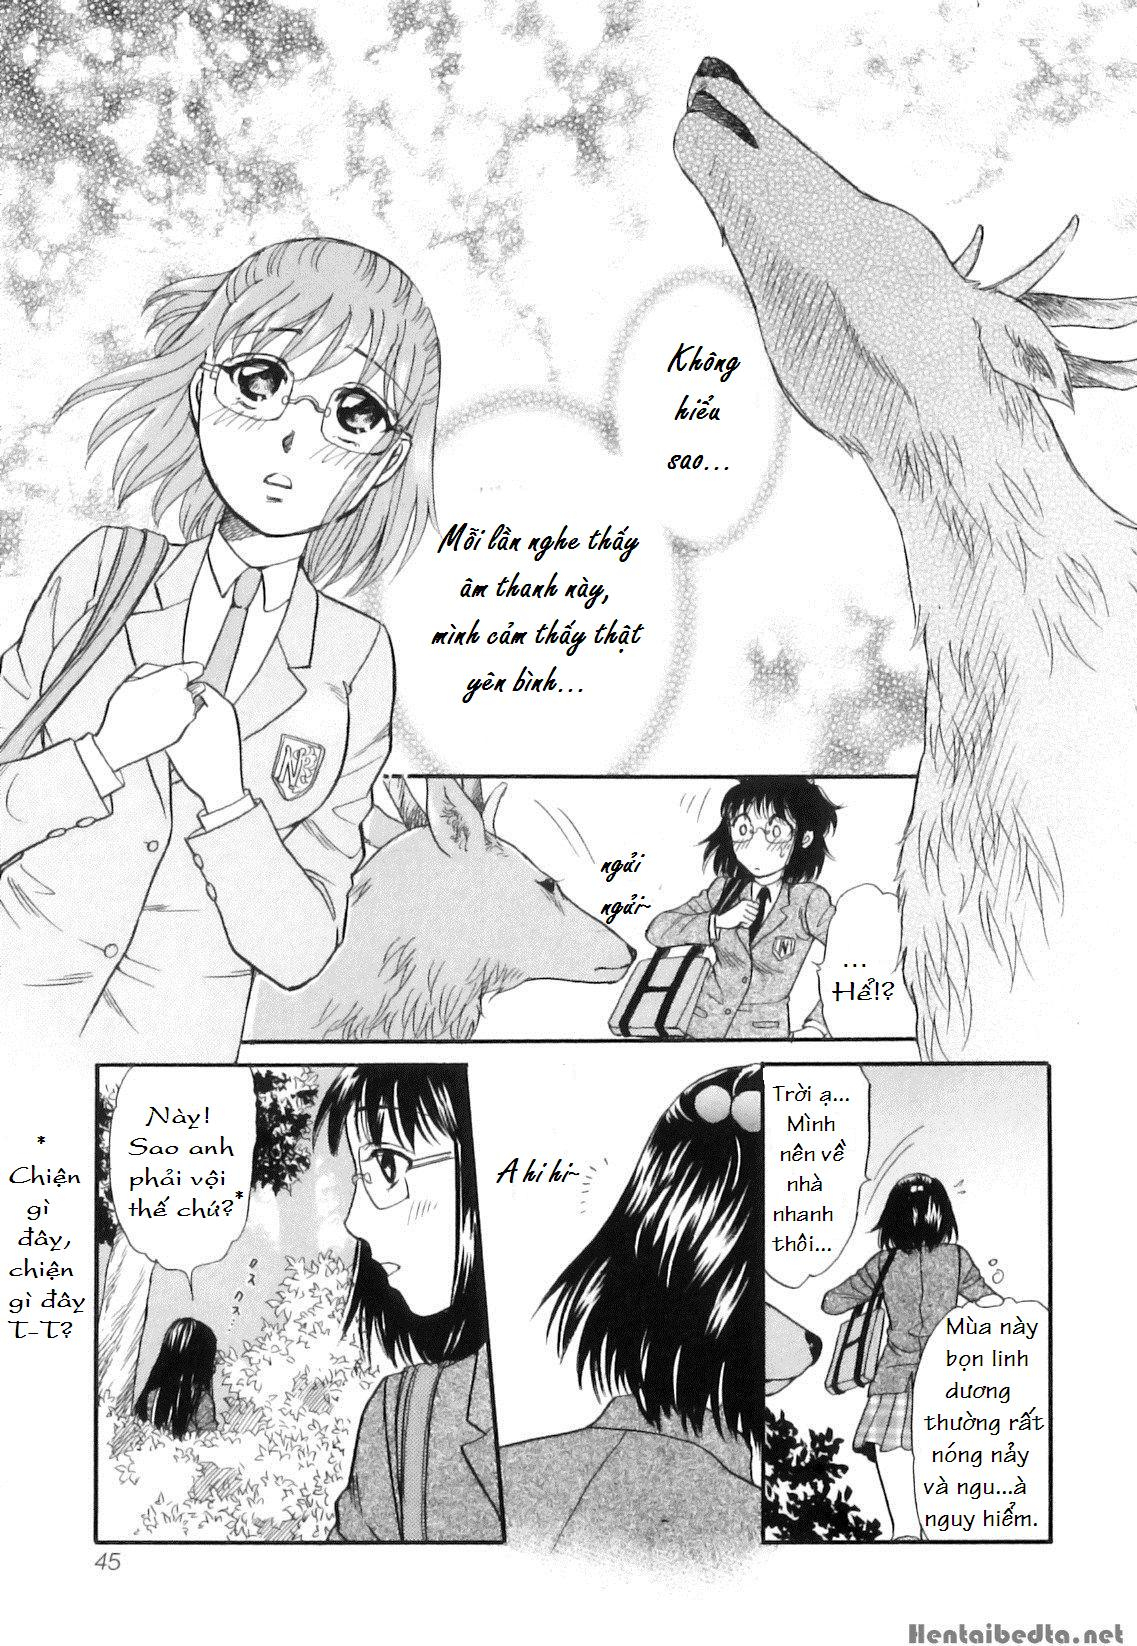 Hình ảnh  trong bài viết Shoujo-tachi no Yukue ~Shishigami no Mori